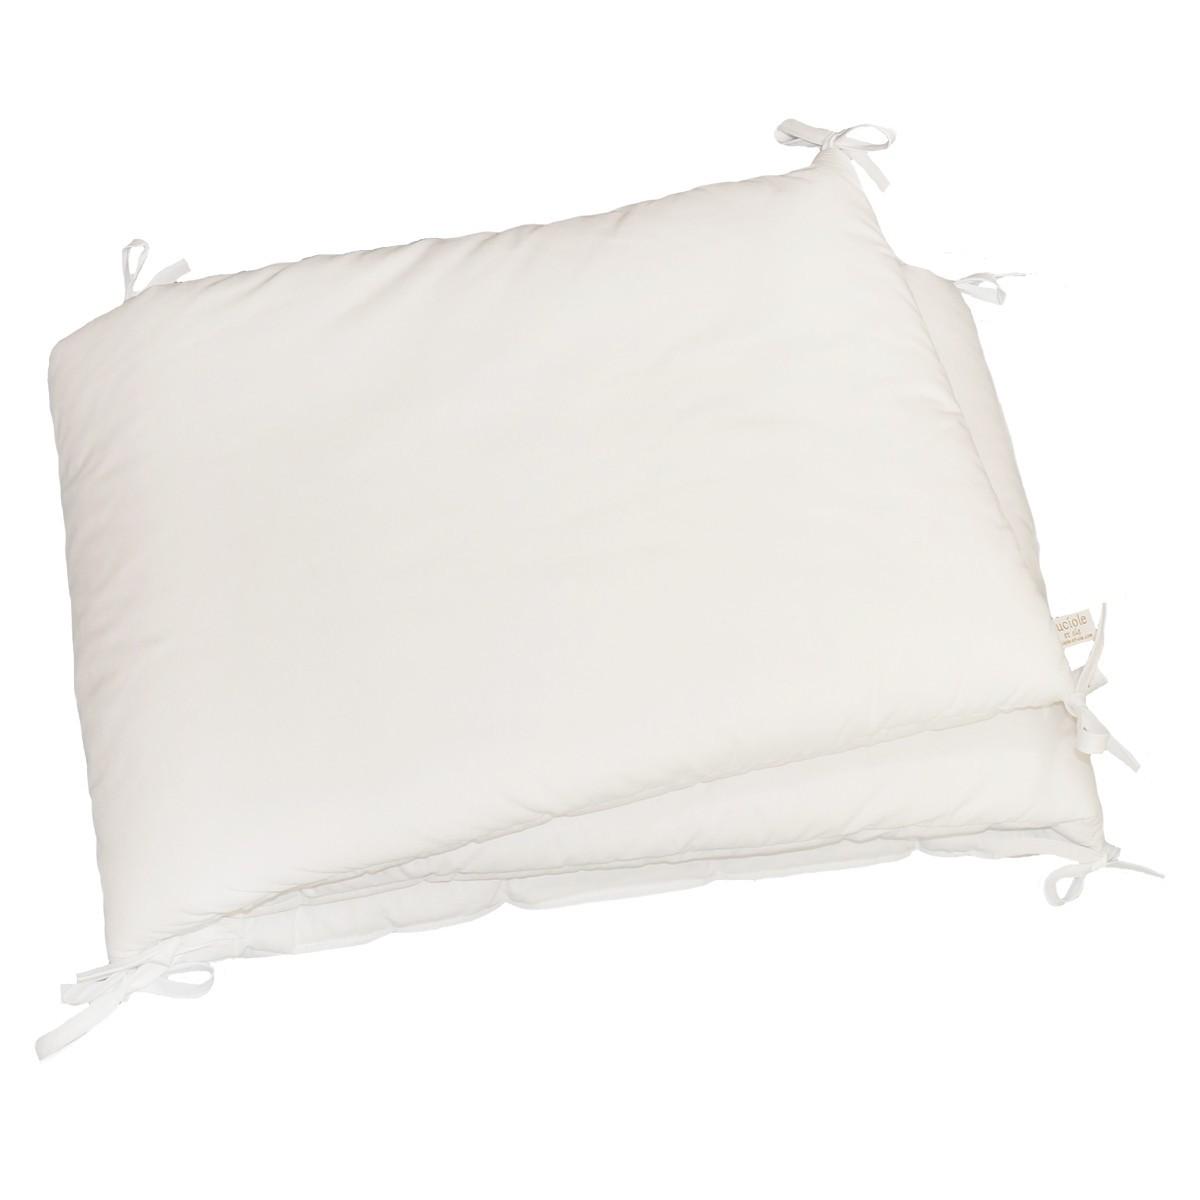 Julius Z/öllner 8200040100/Tour de lit Basic Soft Blanc